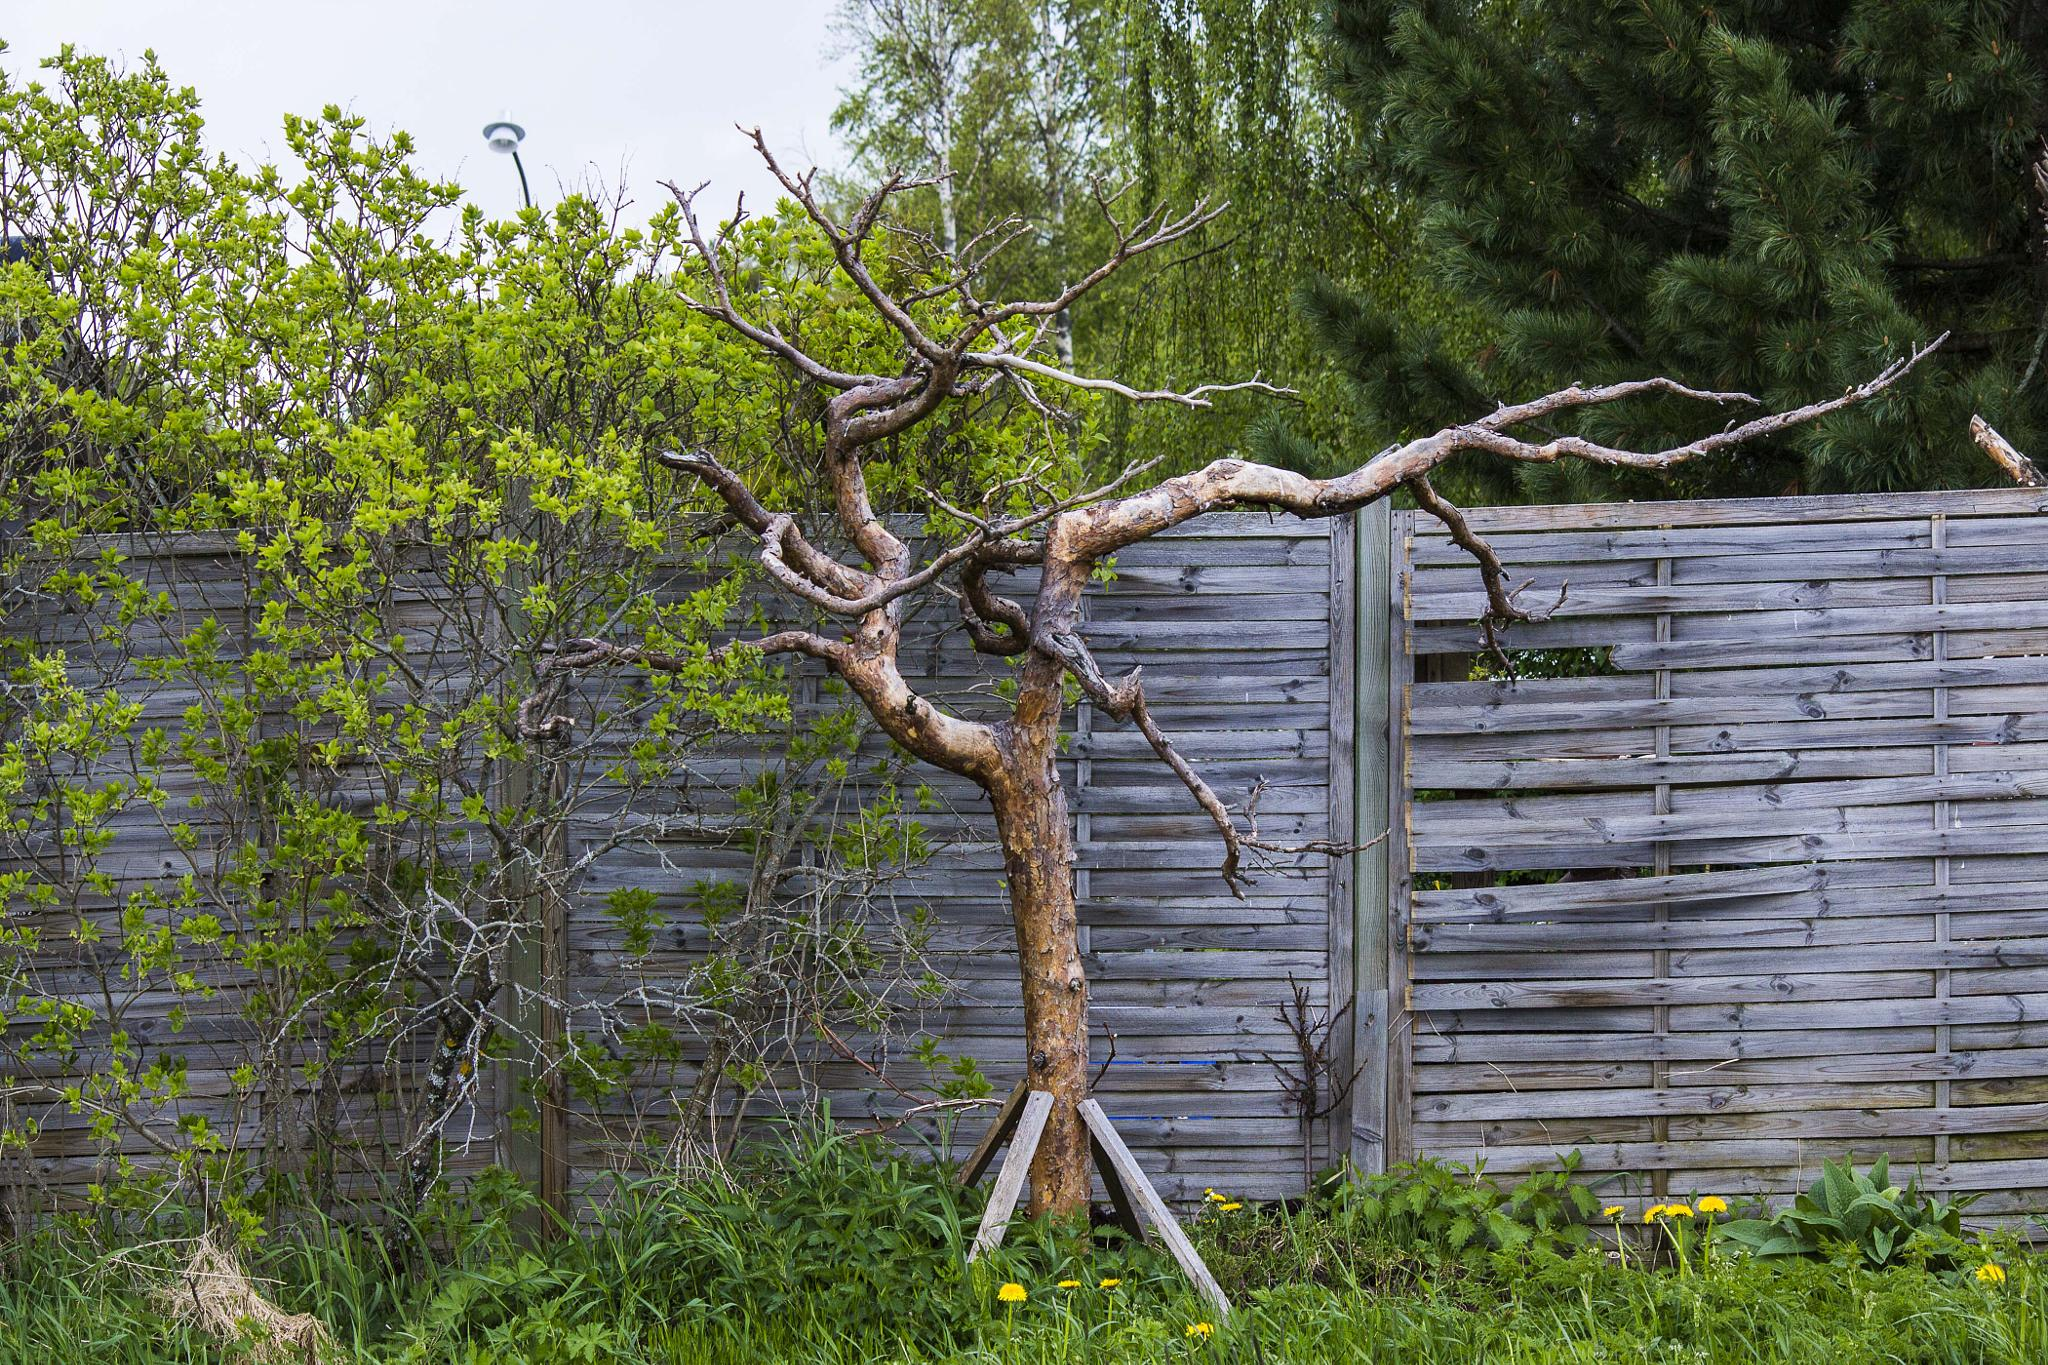 Tree as art by Carl Hult